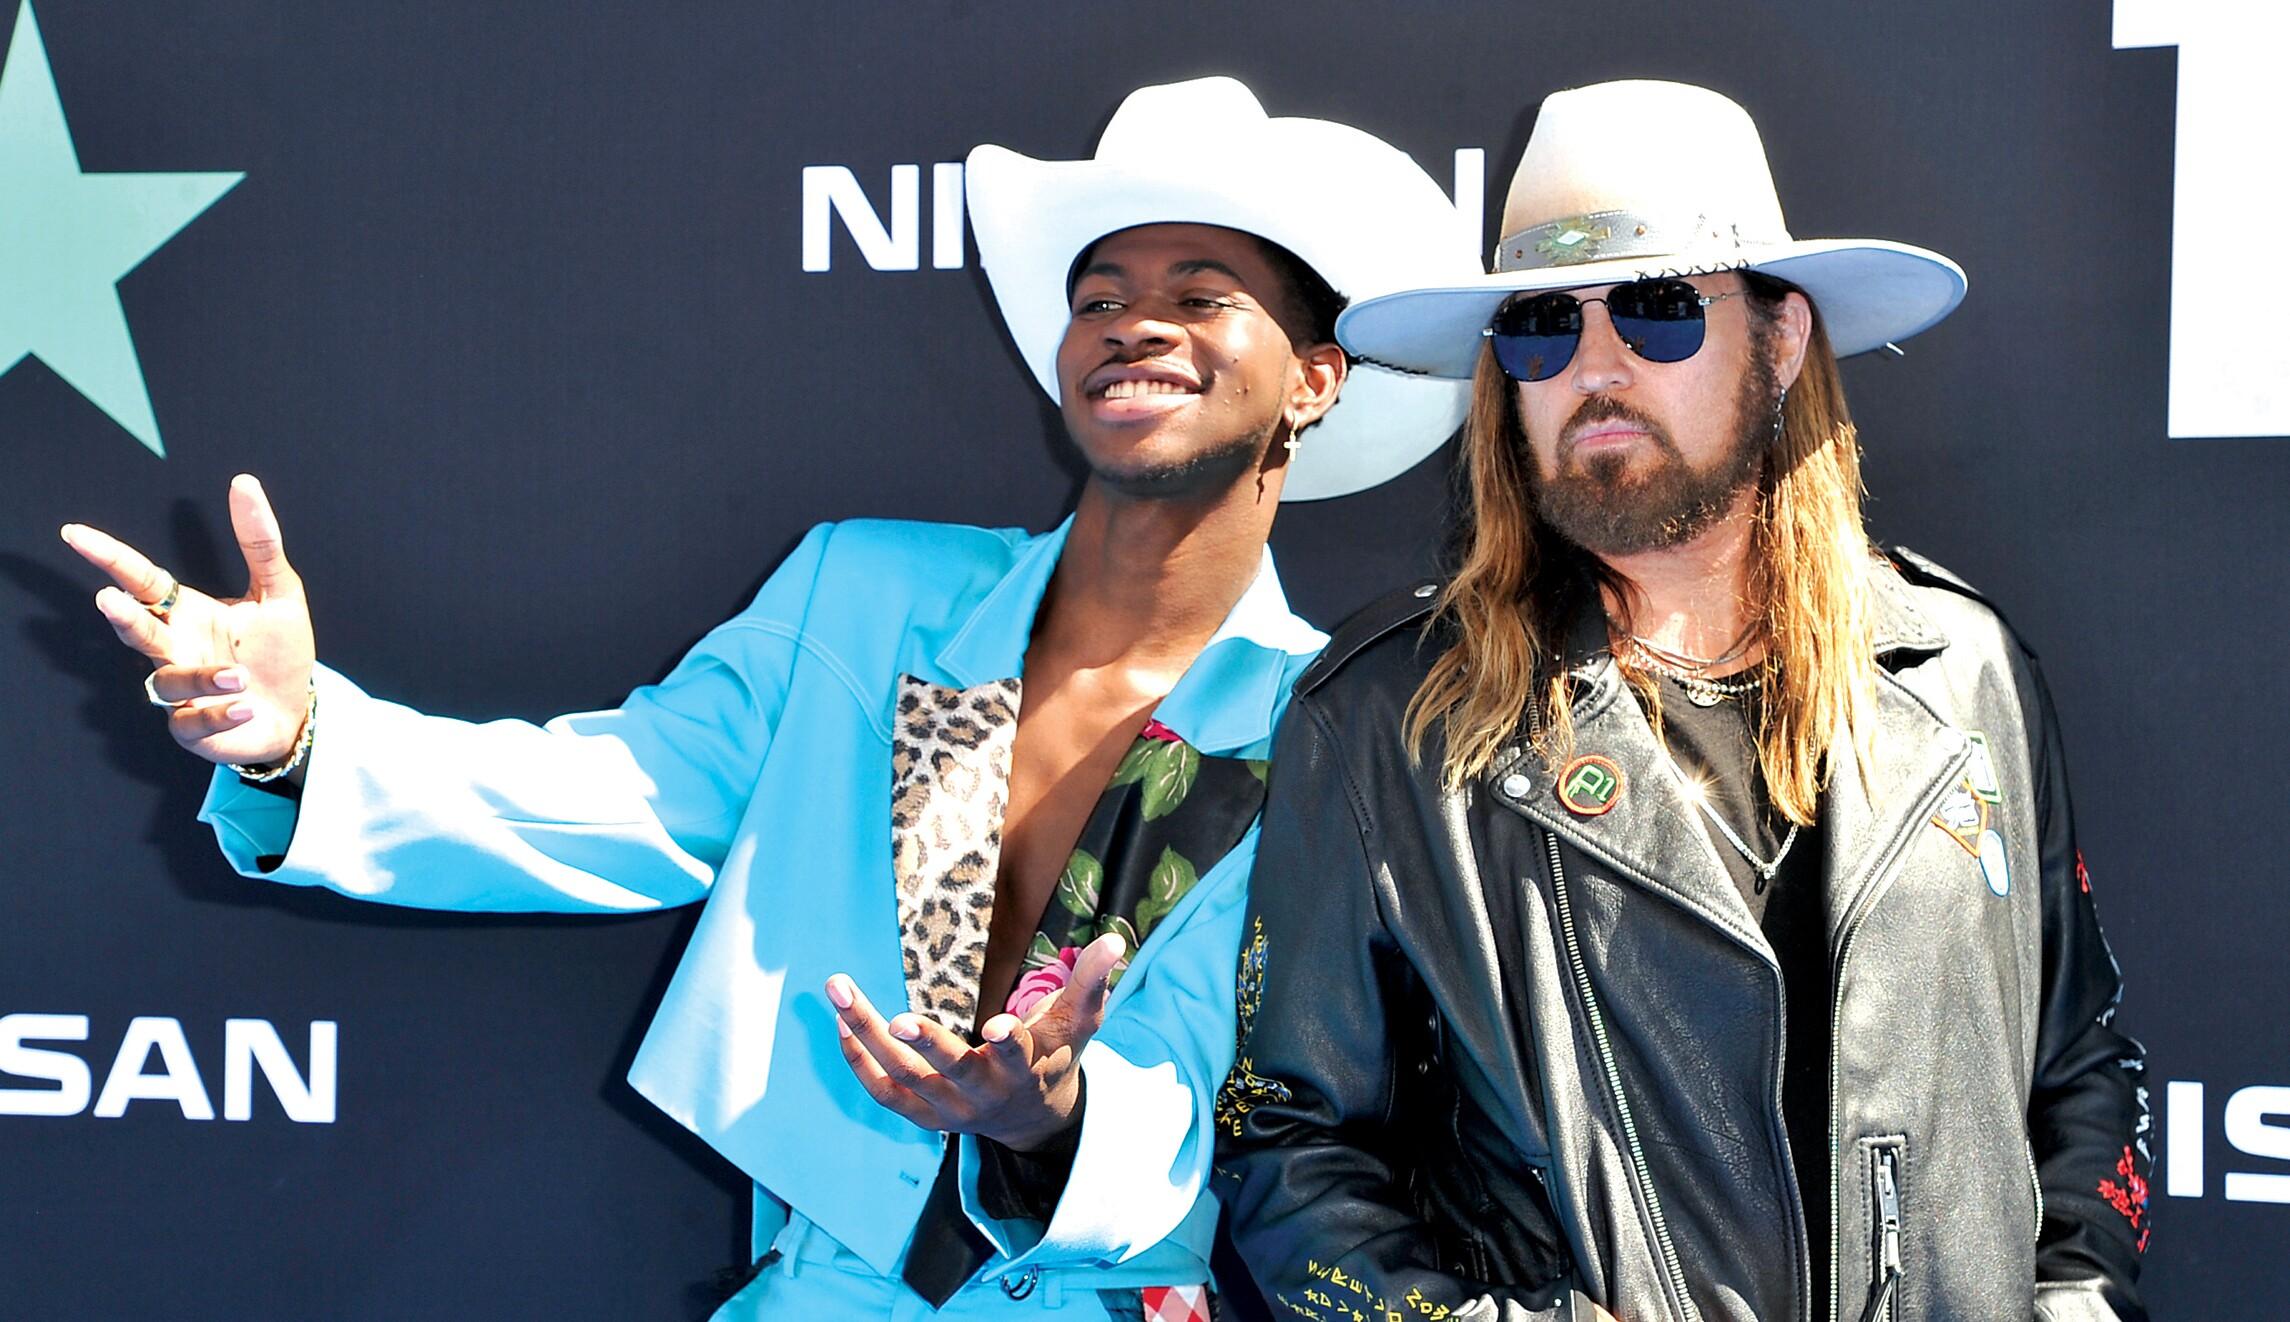 Generation Z makes music history